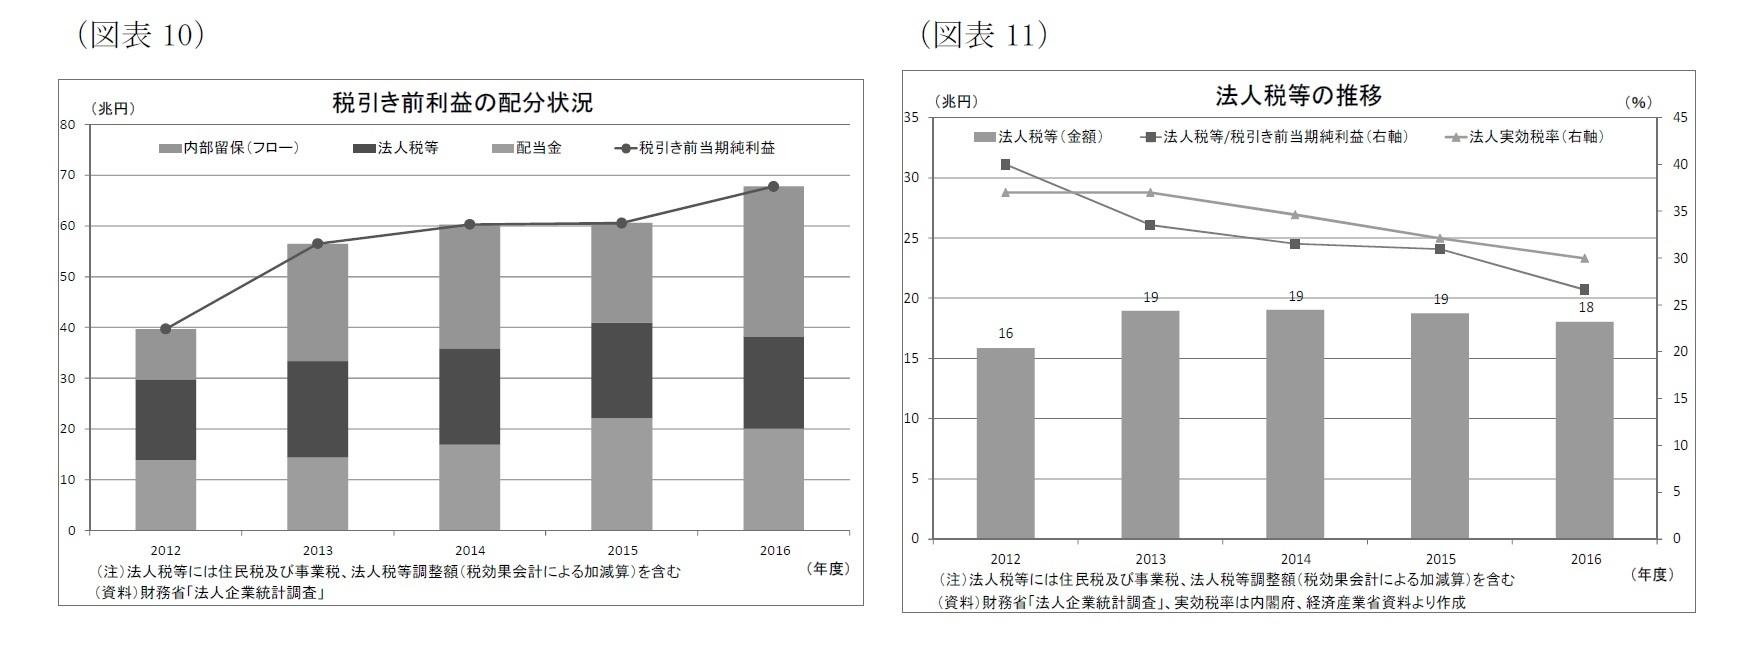 (図表10)税引き前利益の配分状況/(図表11)法人税等の推移